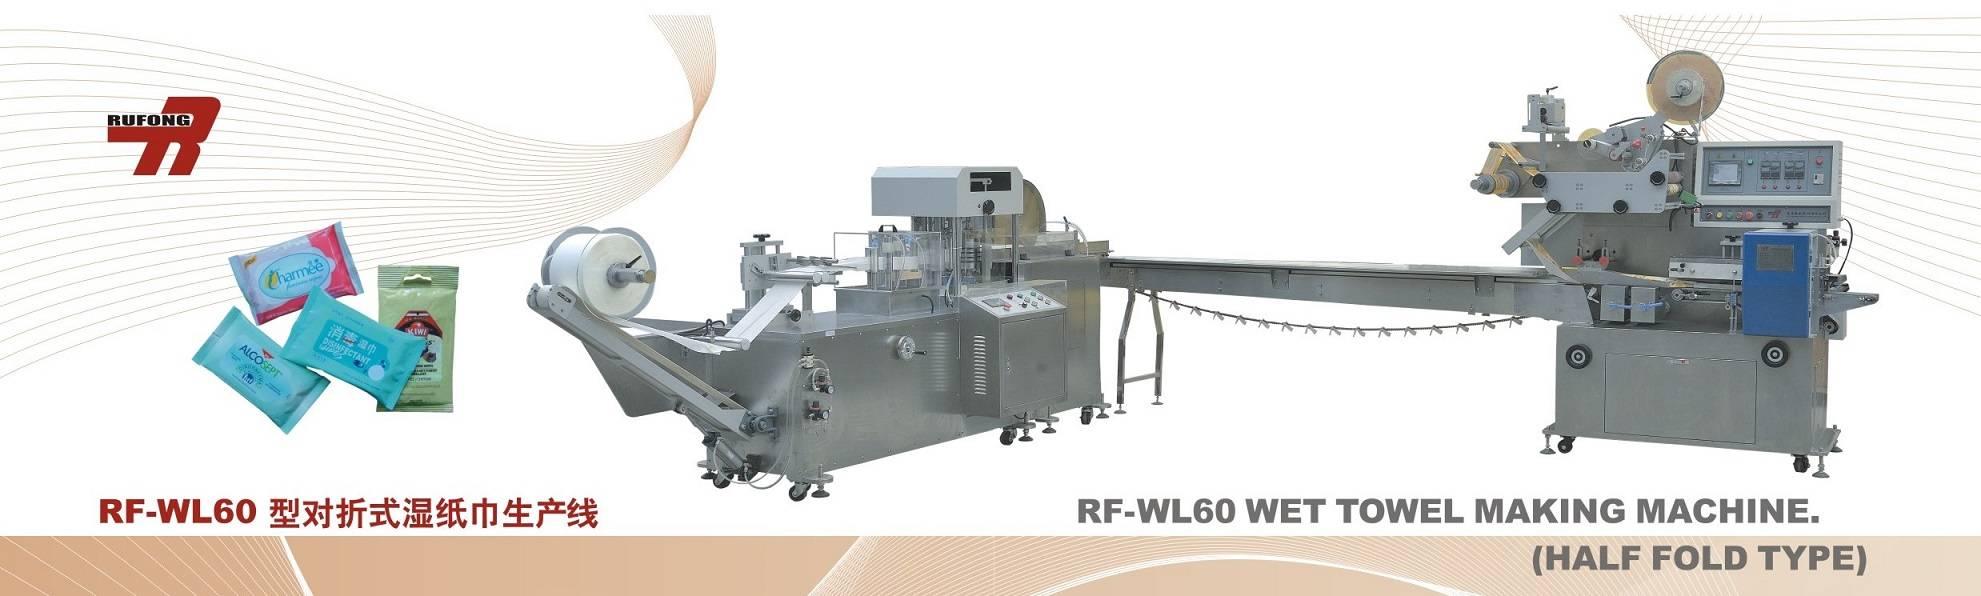 RF-WL60 Wet Towel Making Machine (Half Fold Type)